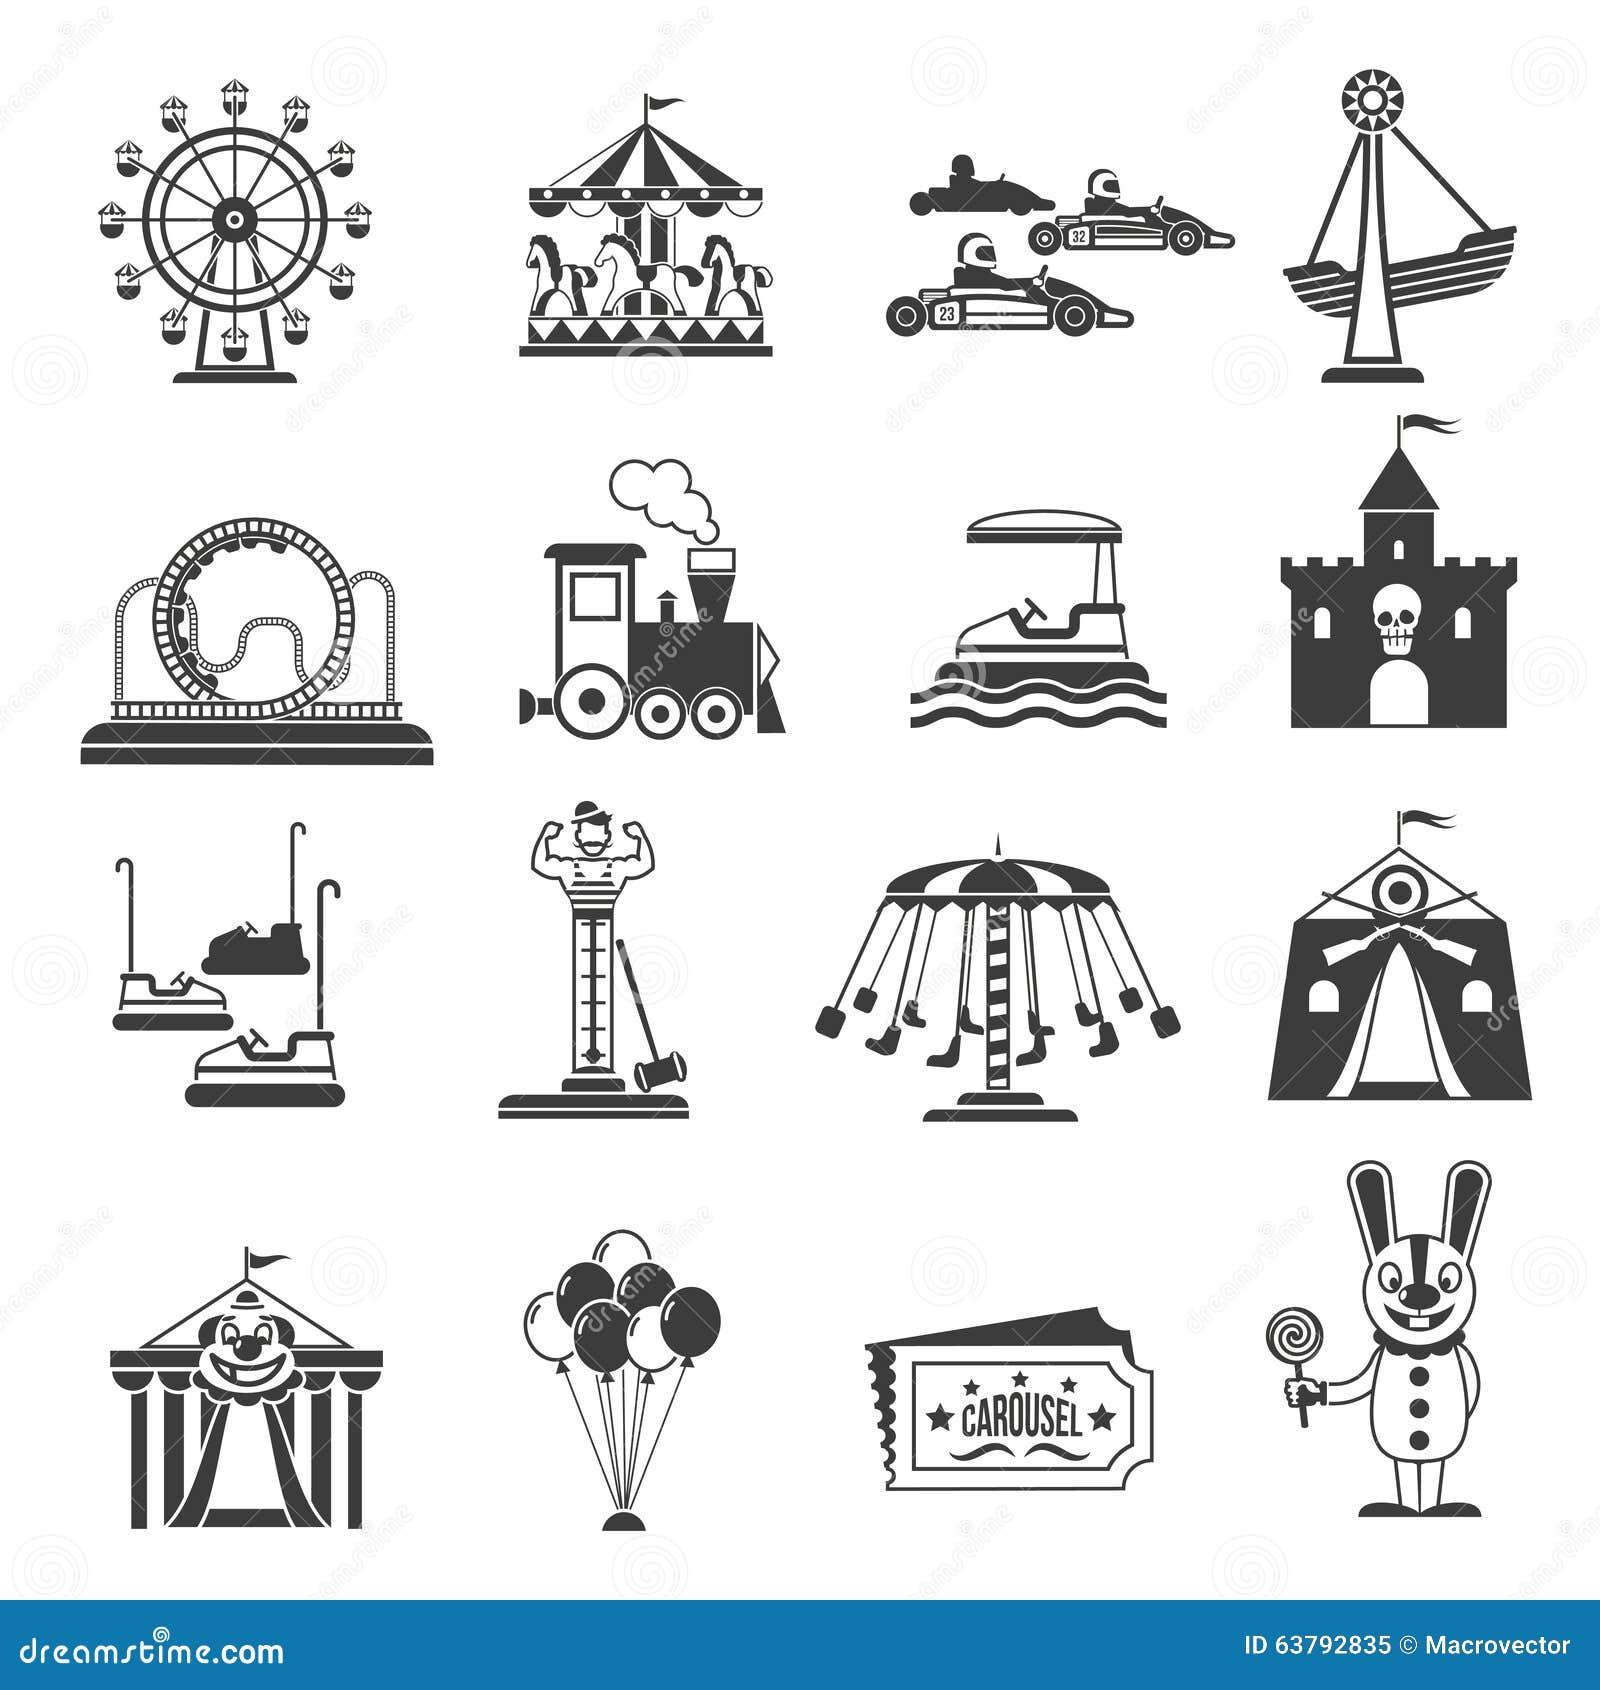 Theme park symbols